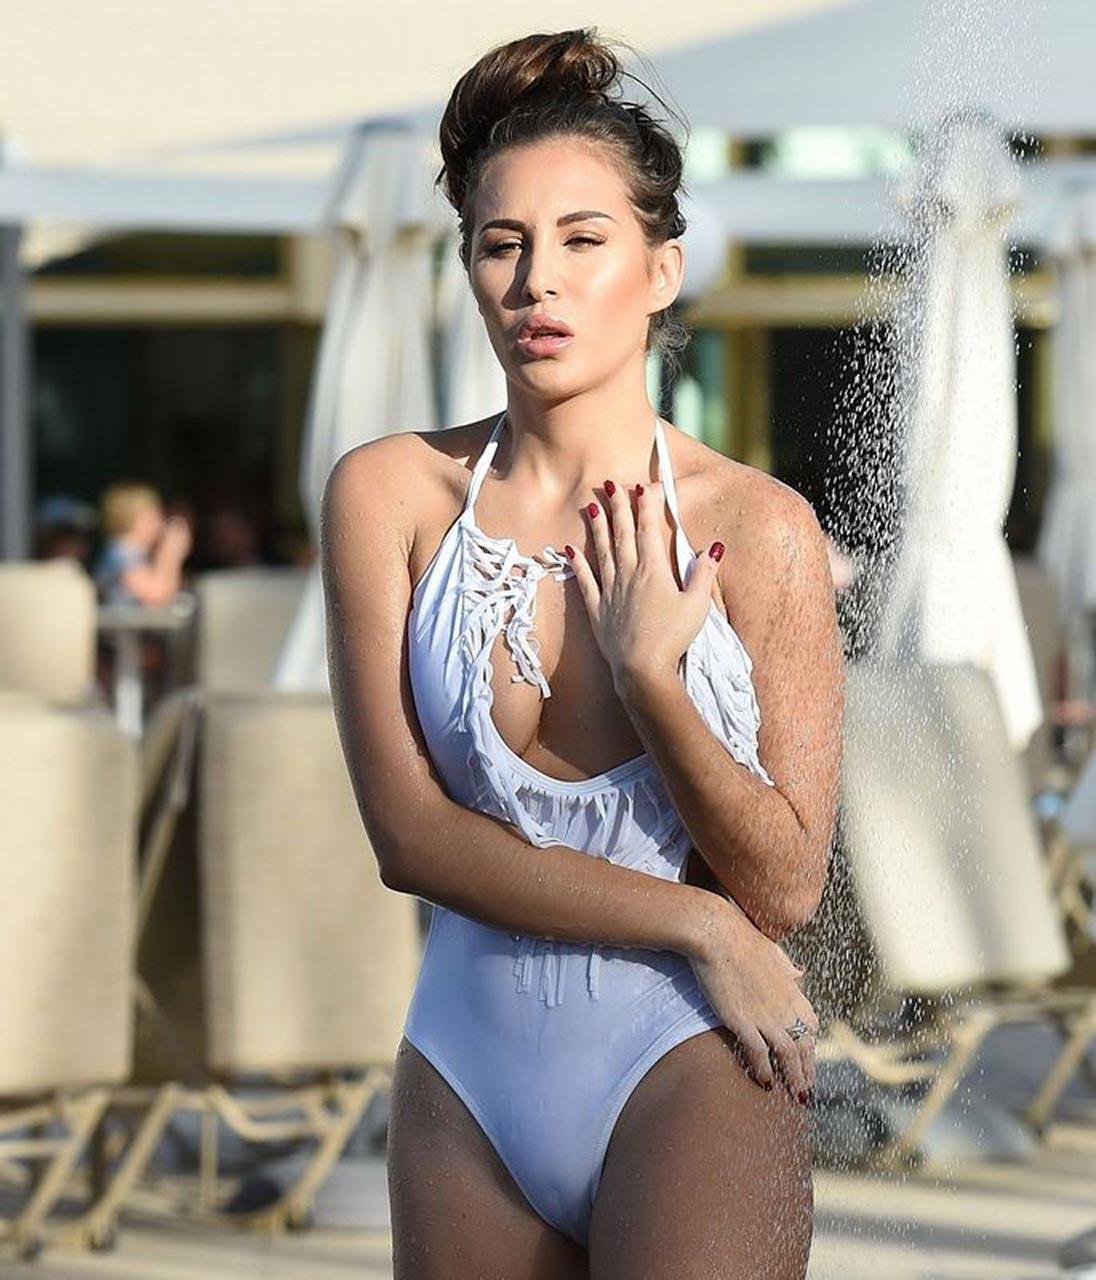 Cameltoe swimsuit Cameltoe Bikini